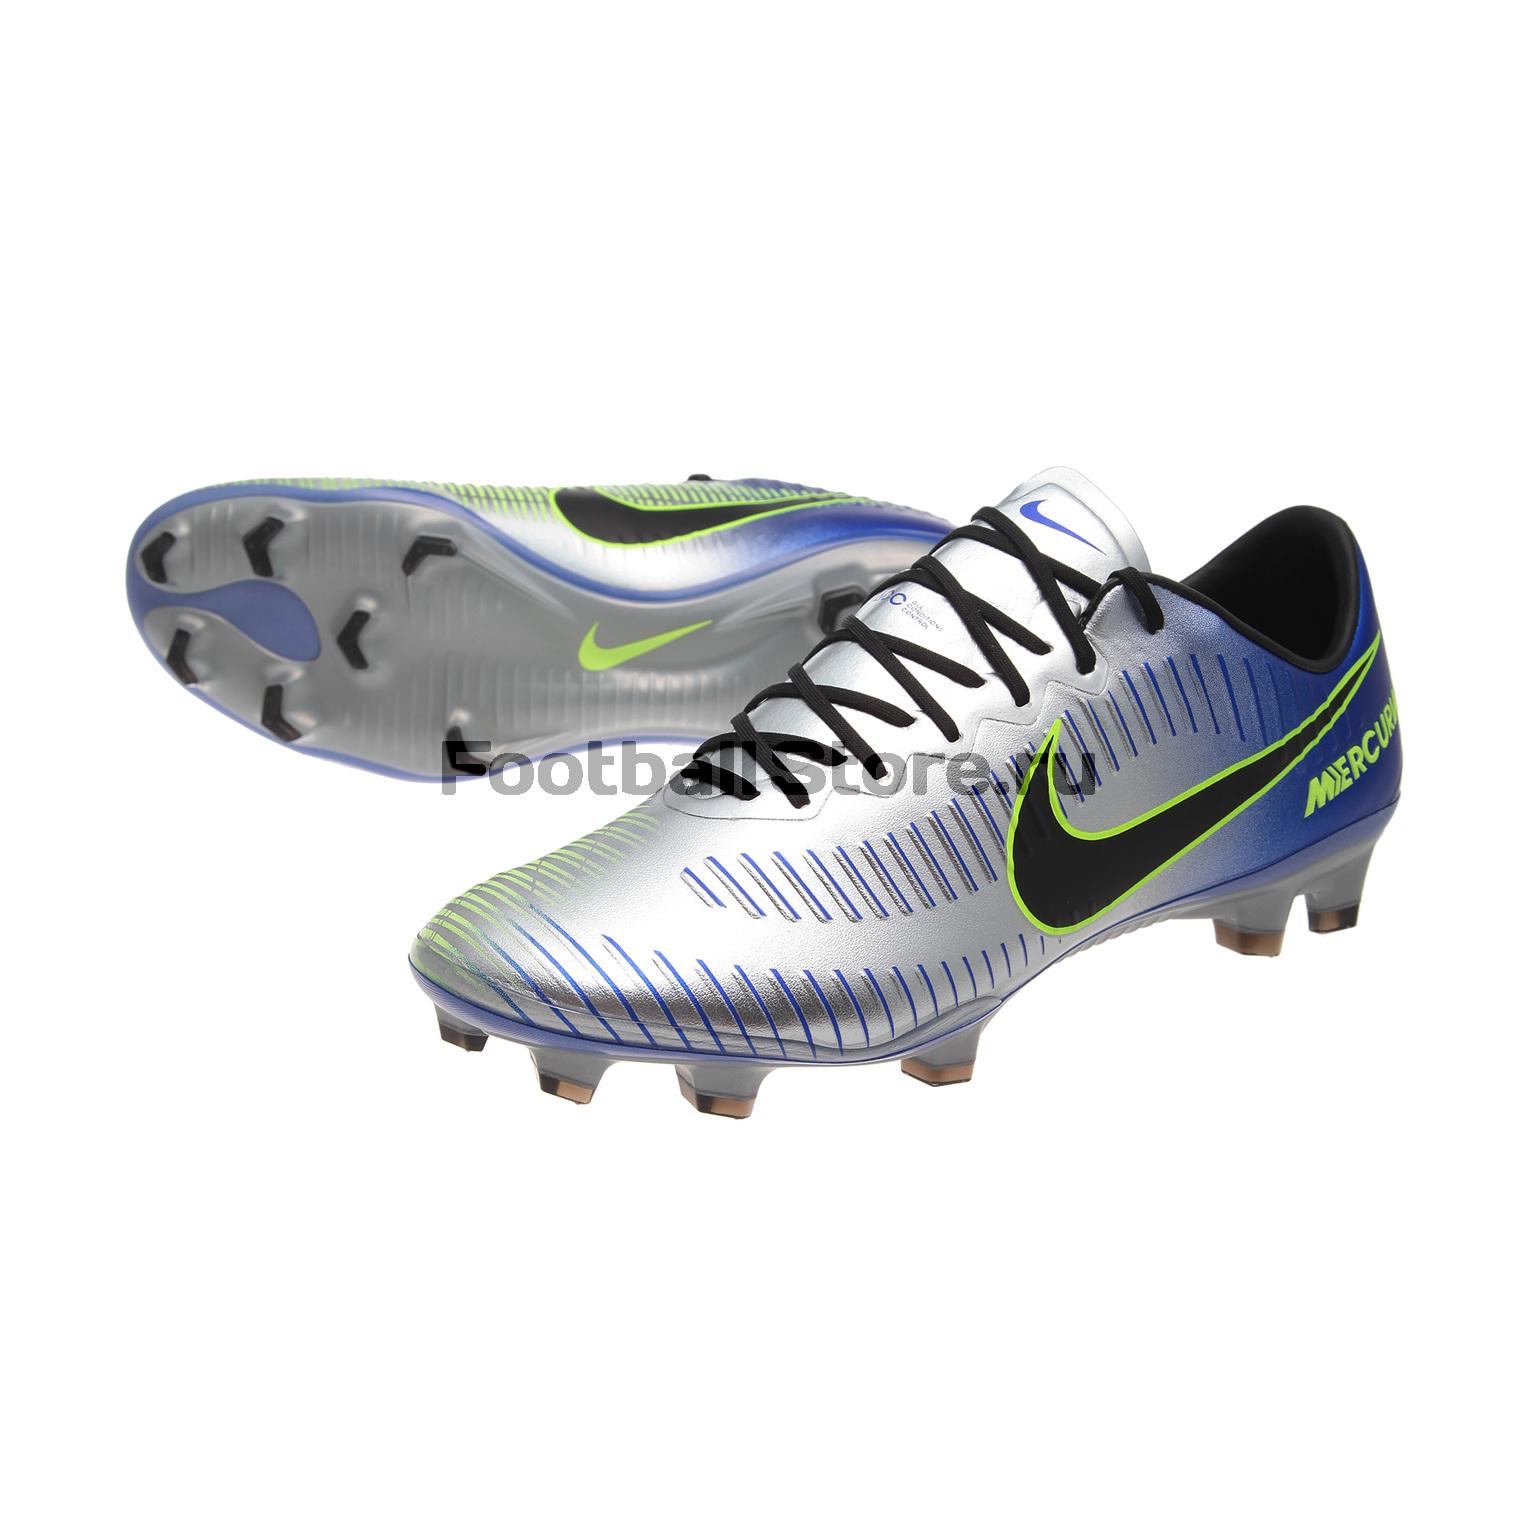 Игровые бутсы Nike Бутсы Nike Mercurial Vapor XI Neymar FG 921547-407 nike nike mercurial lite